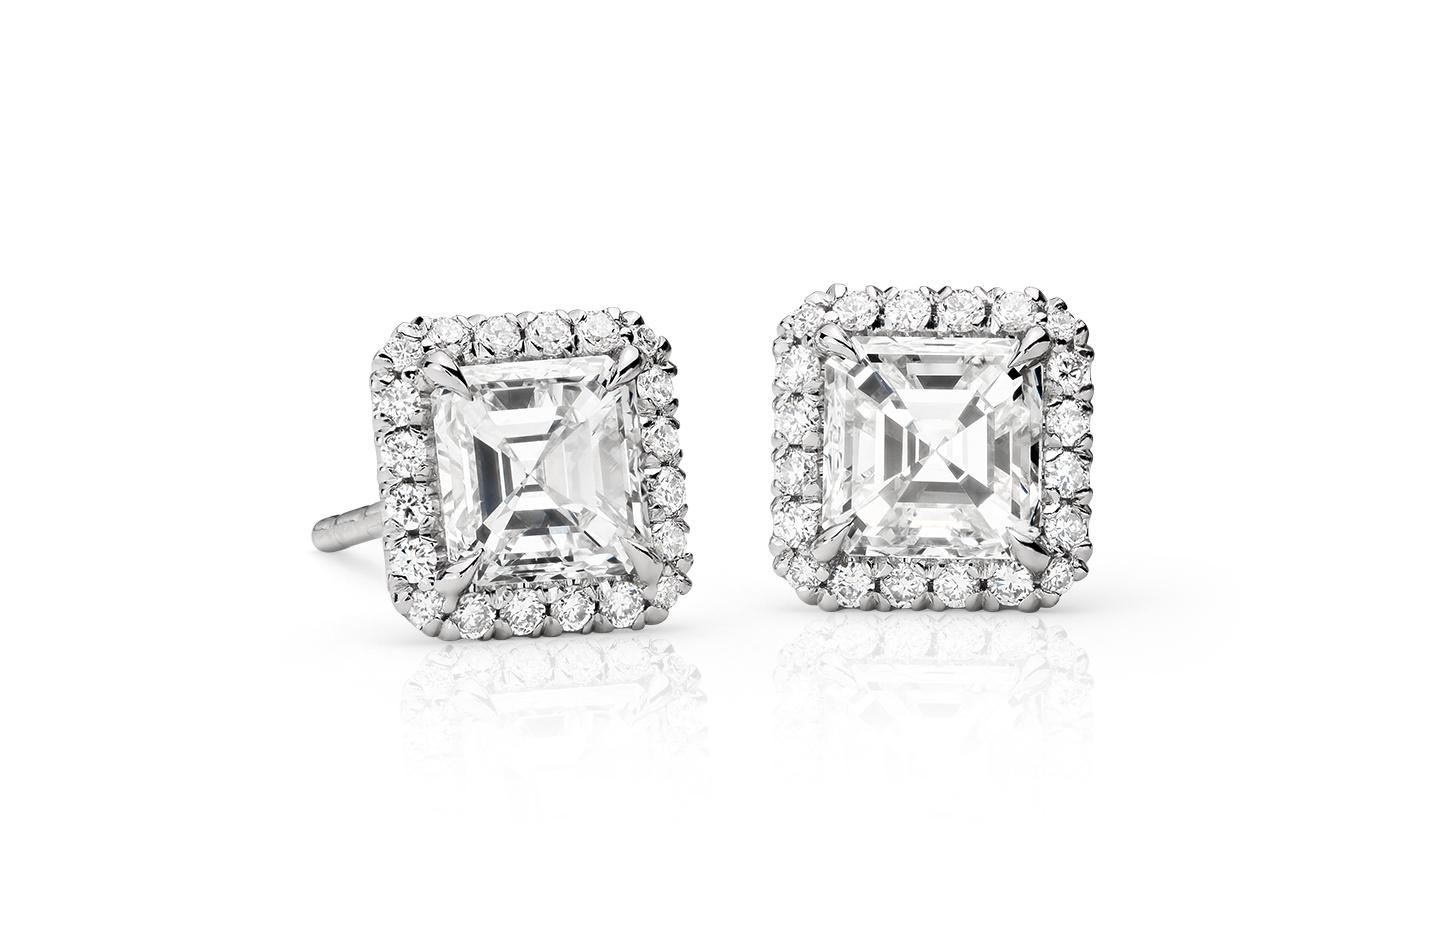 Aretes colgantes con diamantes de talla Asscher en oro blanco de 18 k (1,30 qt. total)